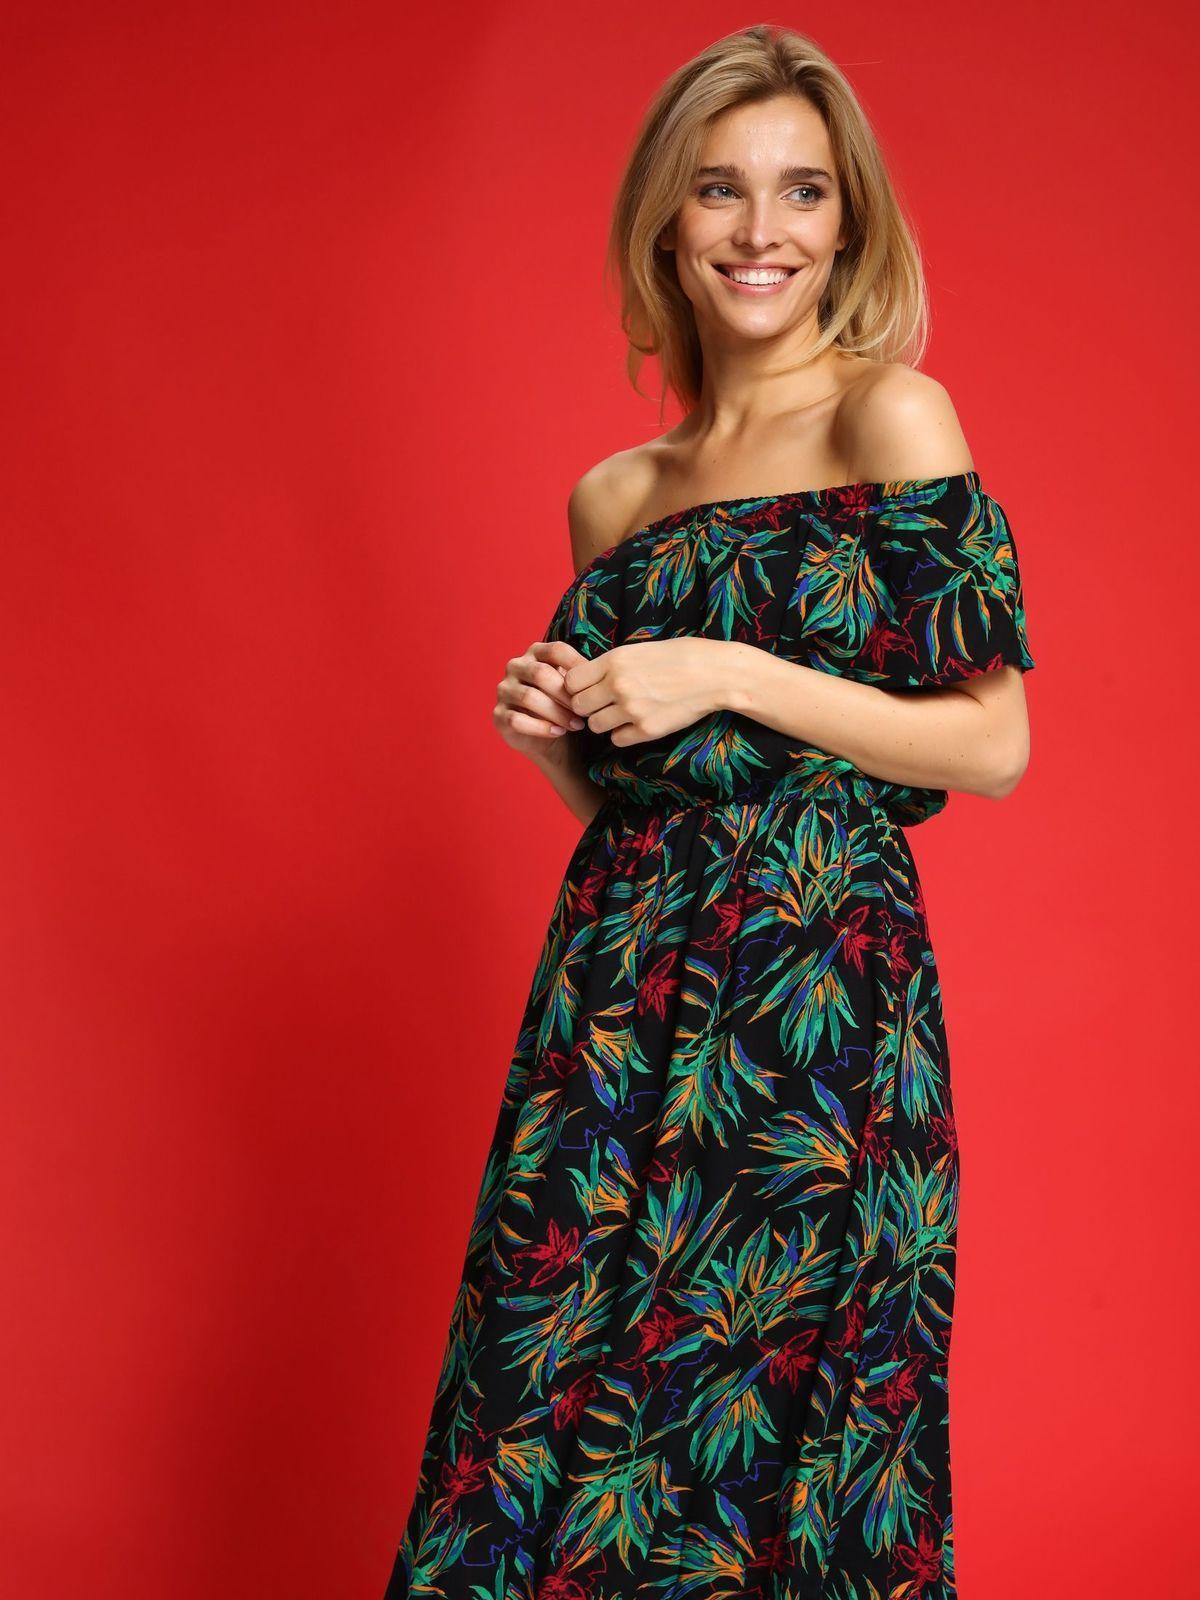 Top Secret Maxi Floral Dress Offshoulder Dluga Sukienka Odkryte Ramiona Falbana Floral Maxi Dress Off Shoulder Dress Dresses